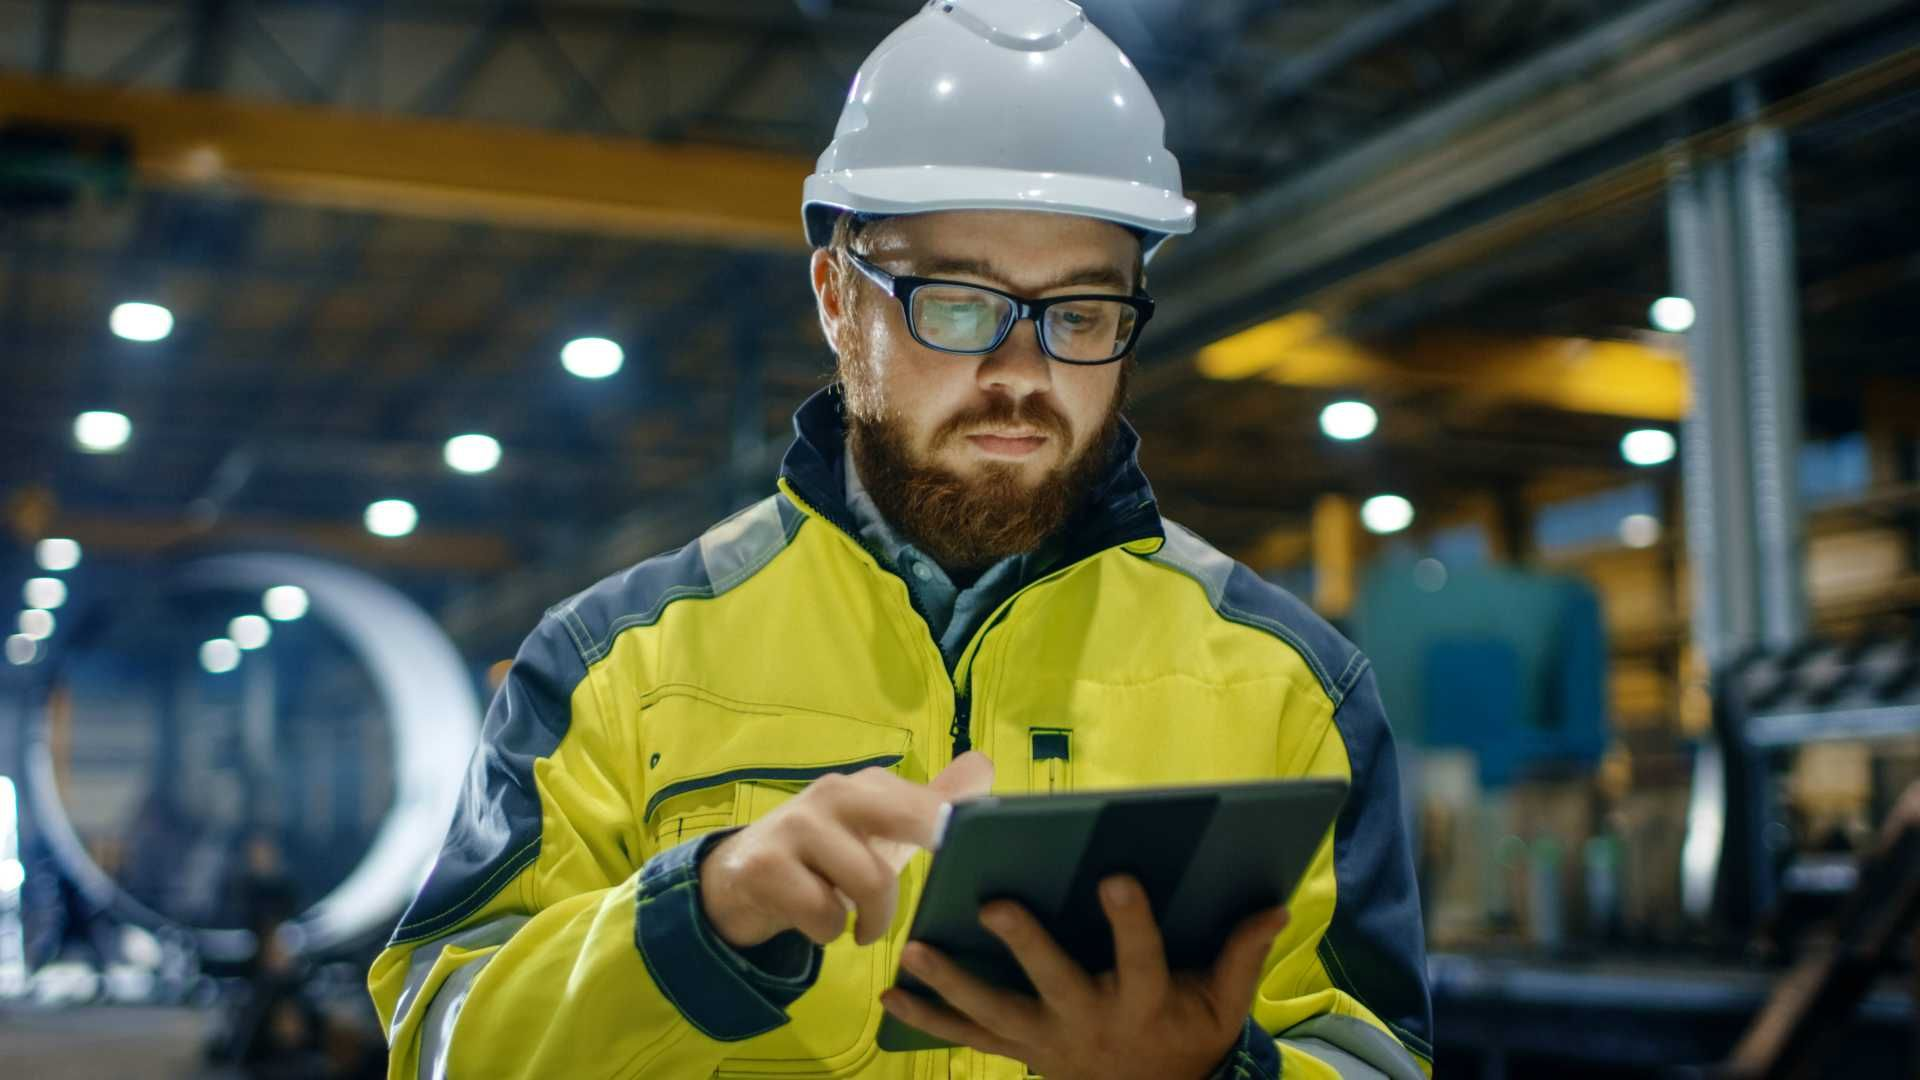 Online Safety Training in 2020 Online safety training